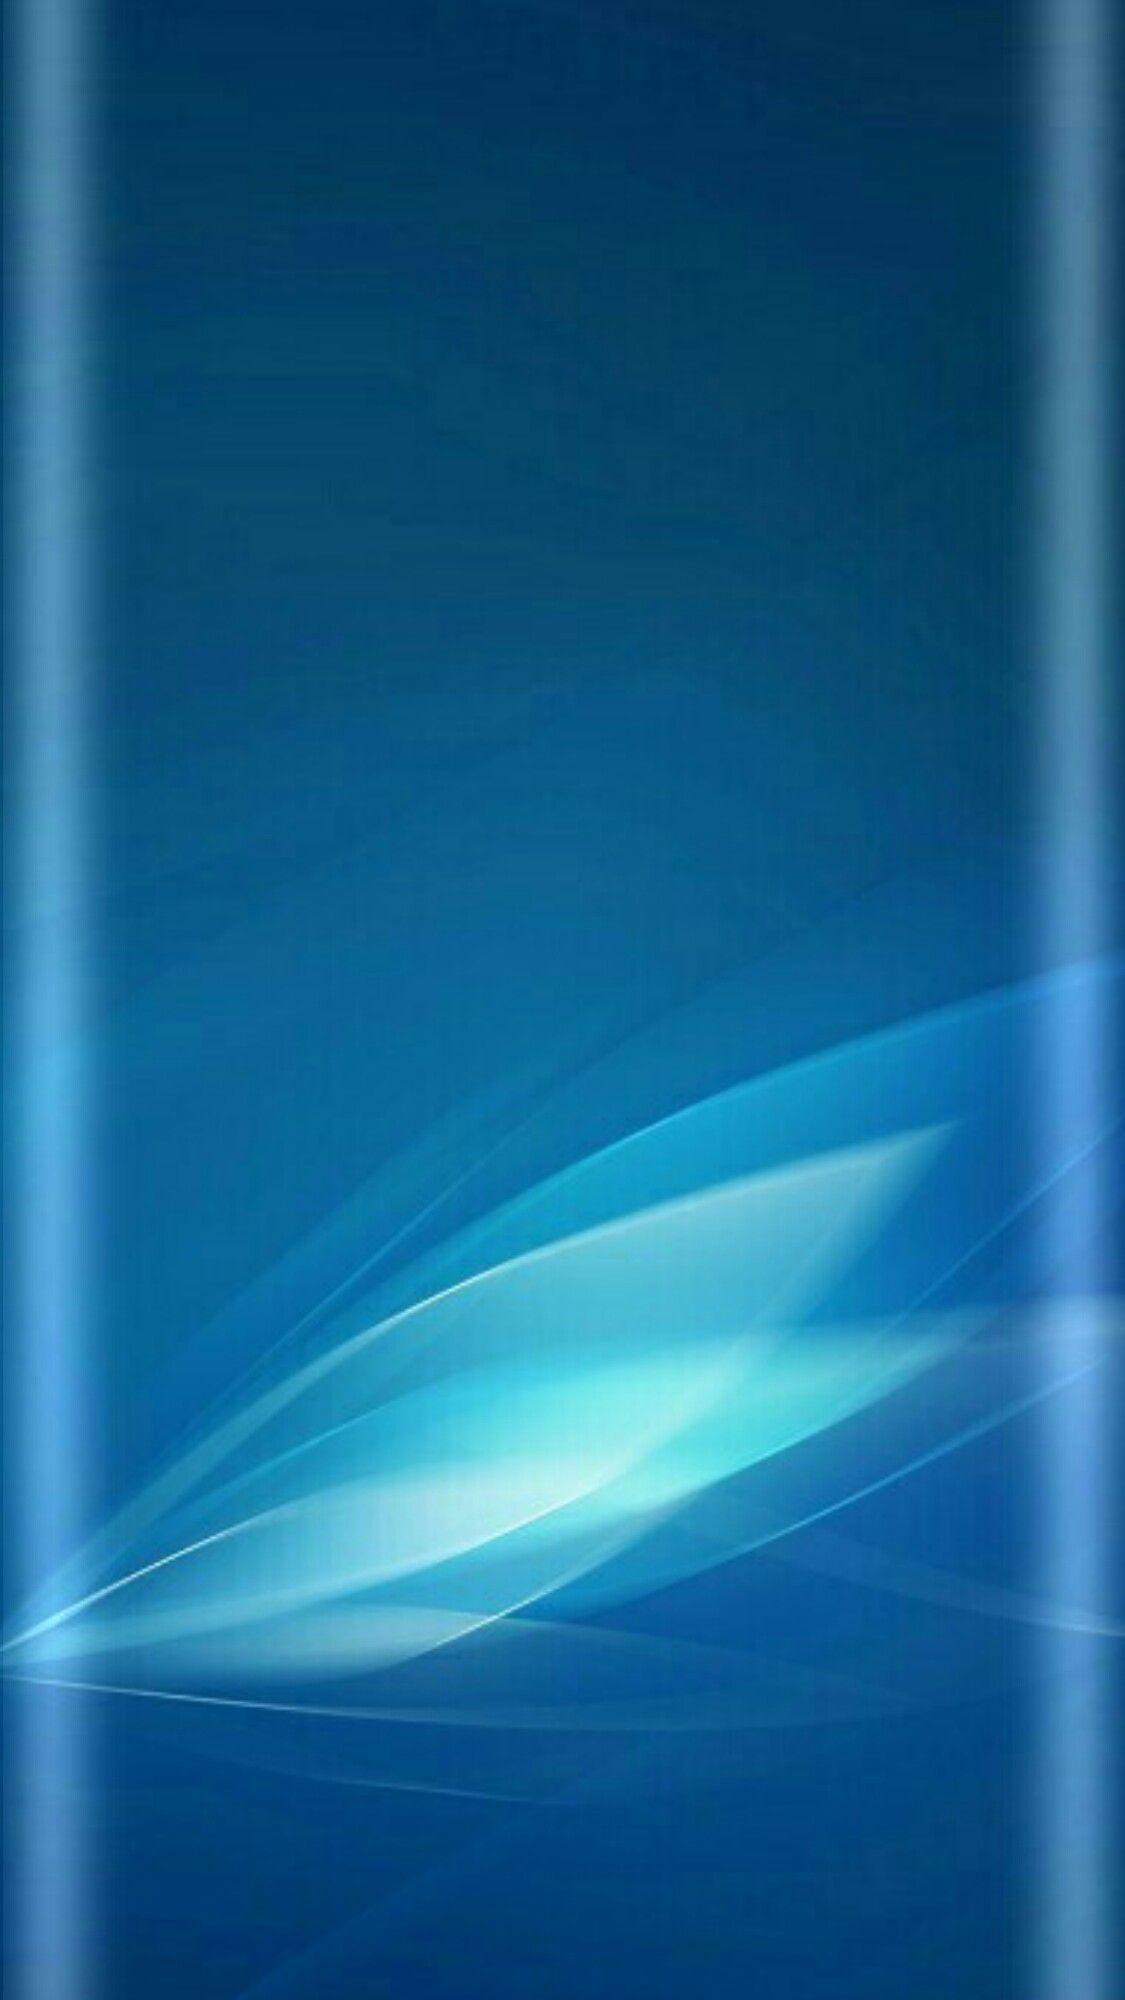 Telefoon Phone Wallpaper Samsung Wallpaper Galaxies Wallpaper Galaxy s7 moving wallpaper